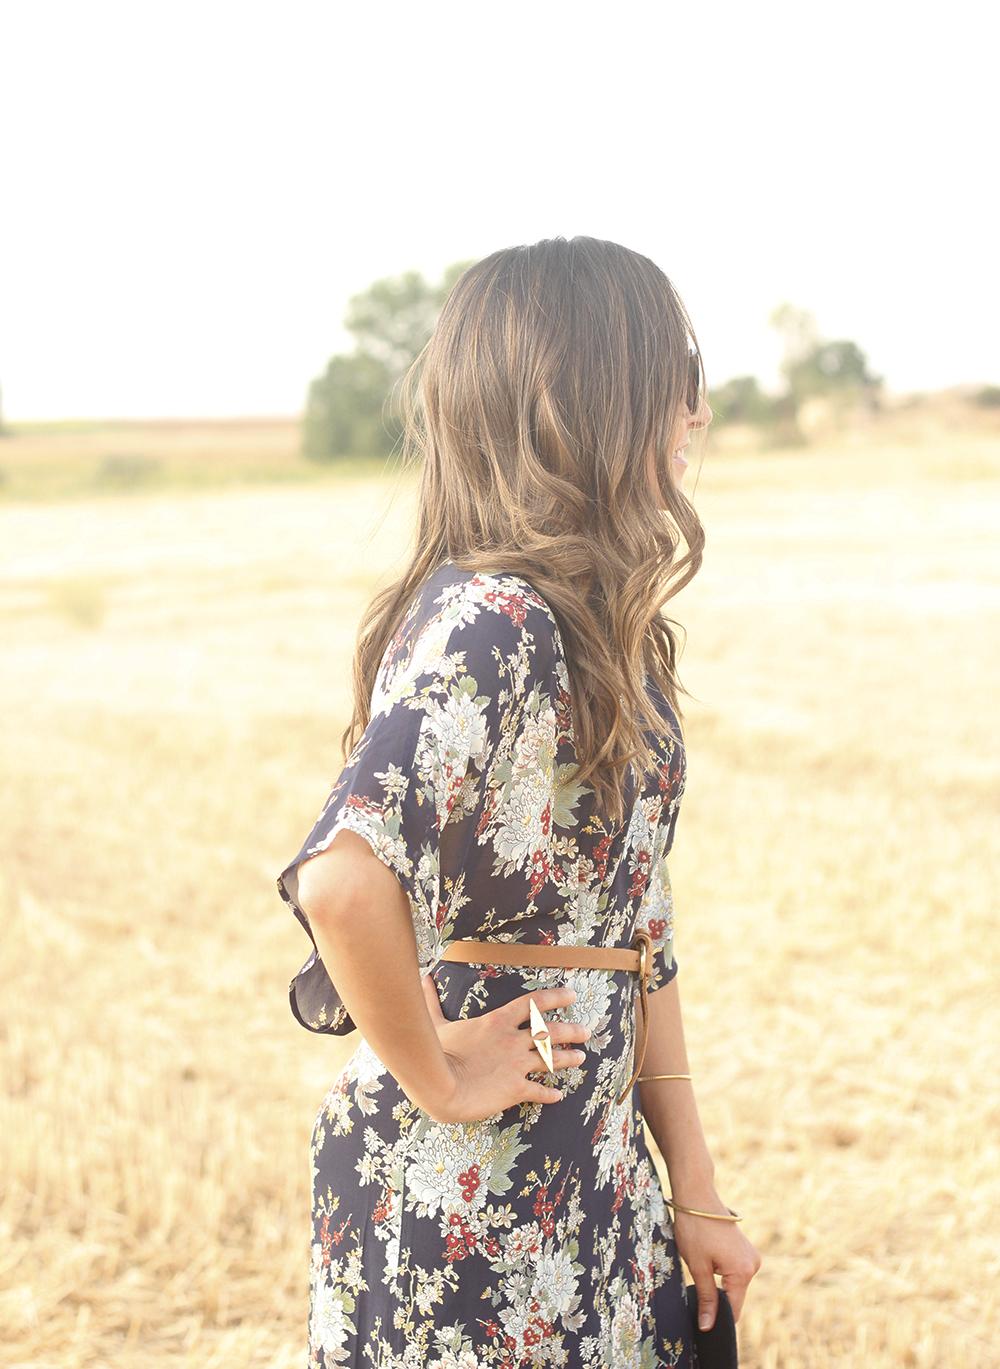 Maxi floral print dress uterqüe blue hat sunnies countryside summer outfit flat sandals massimo dutti21